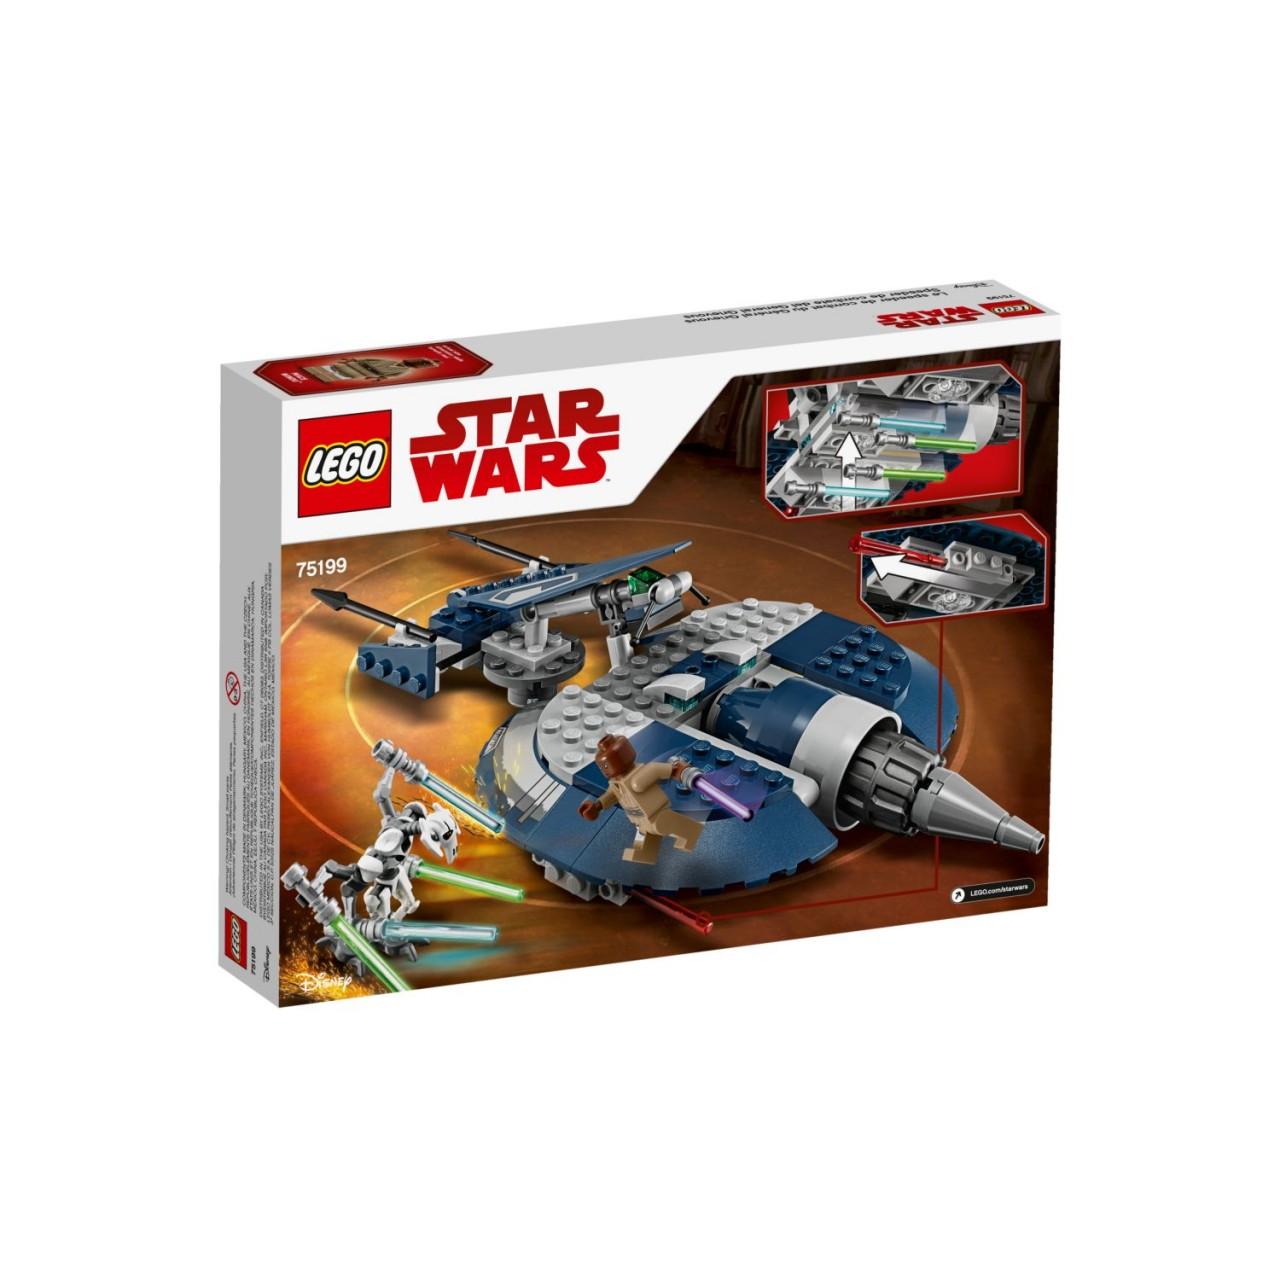 LEGO STAR WARS 75199 General Grievous Combat Speeder